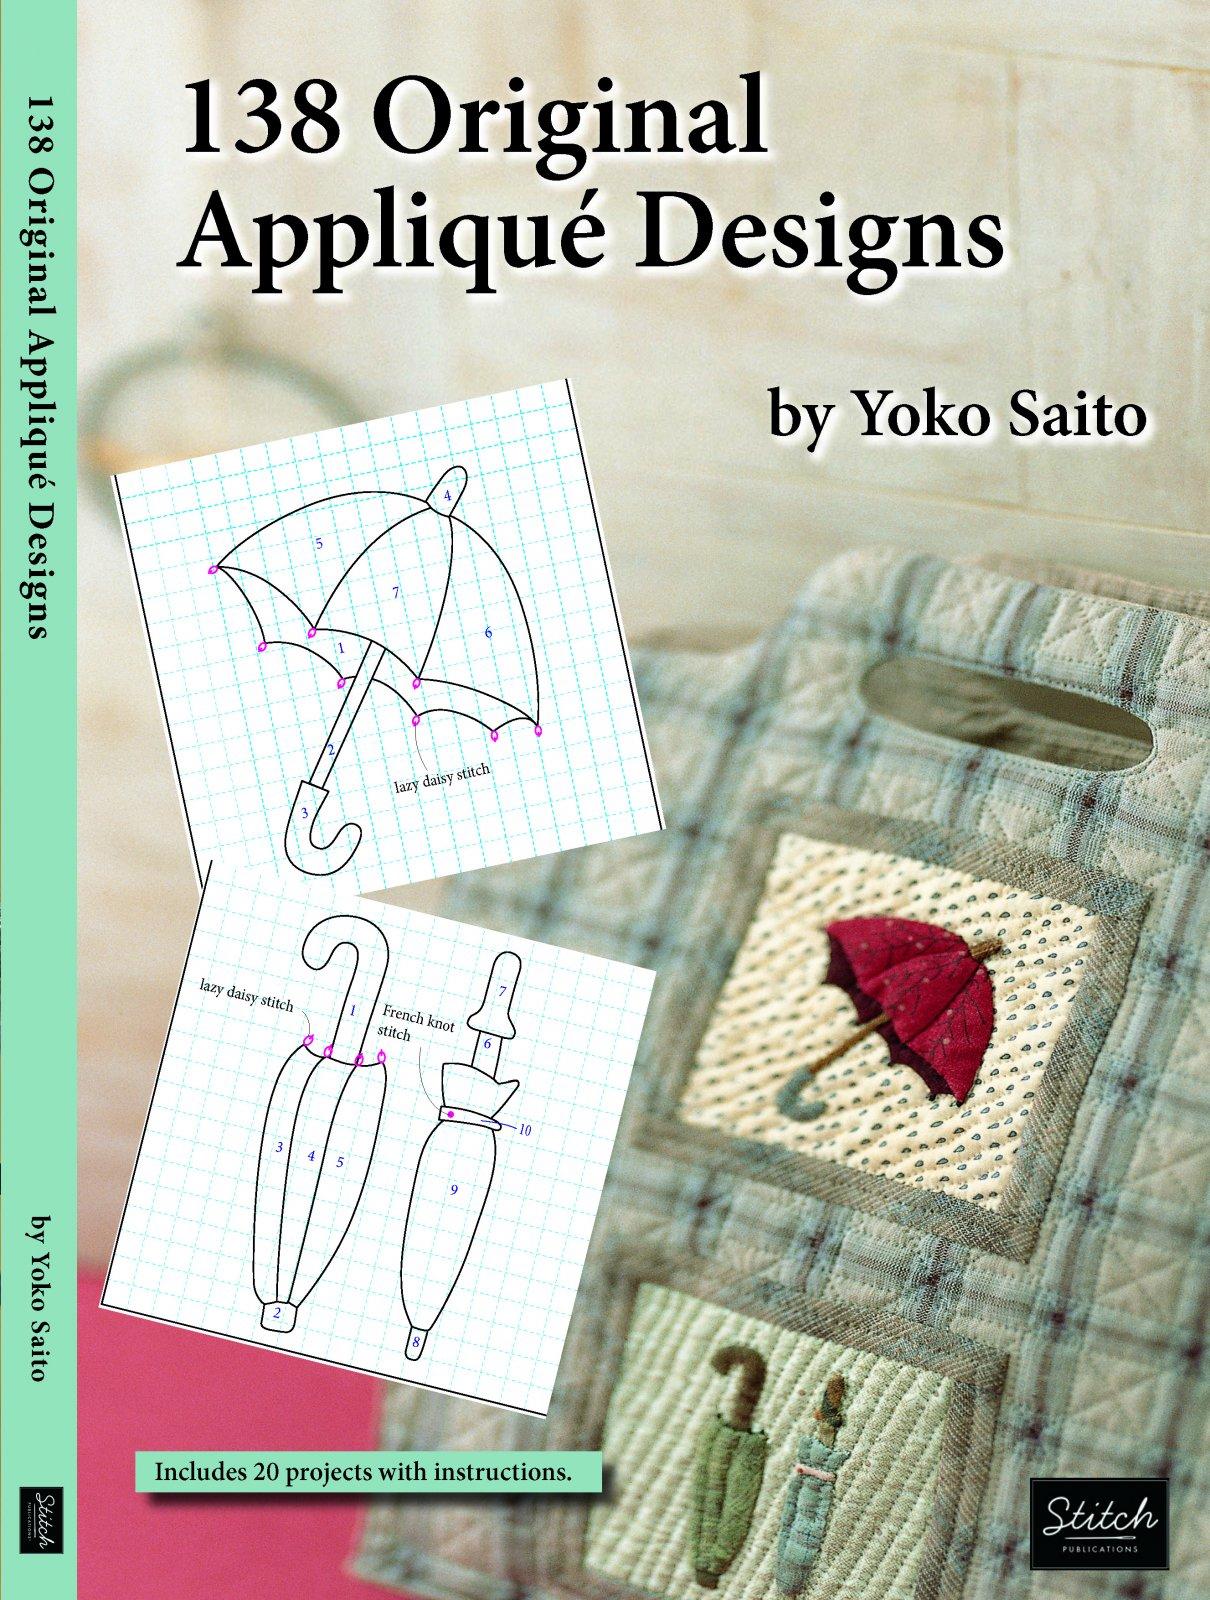 138 Original Applique Designs by Yoko Saito (English)